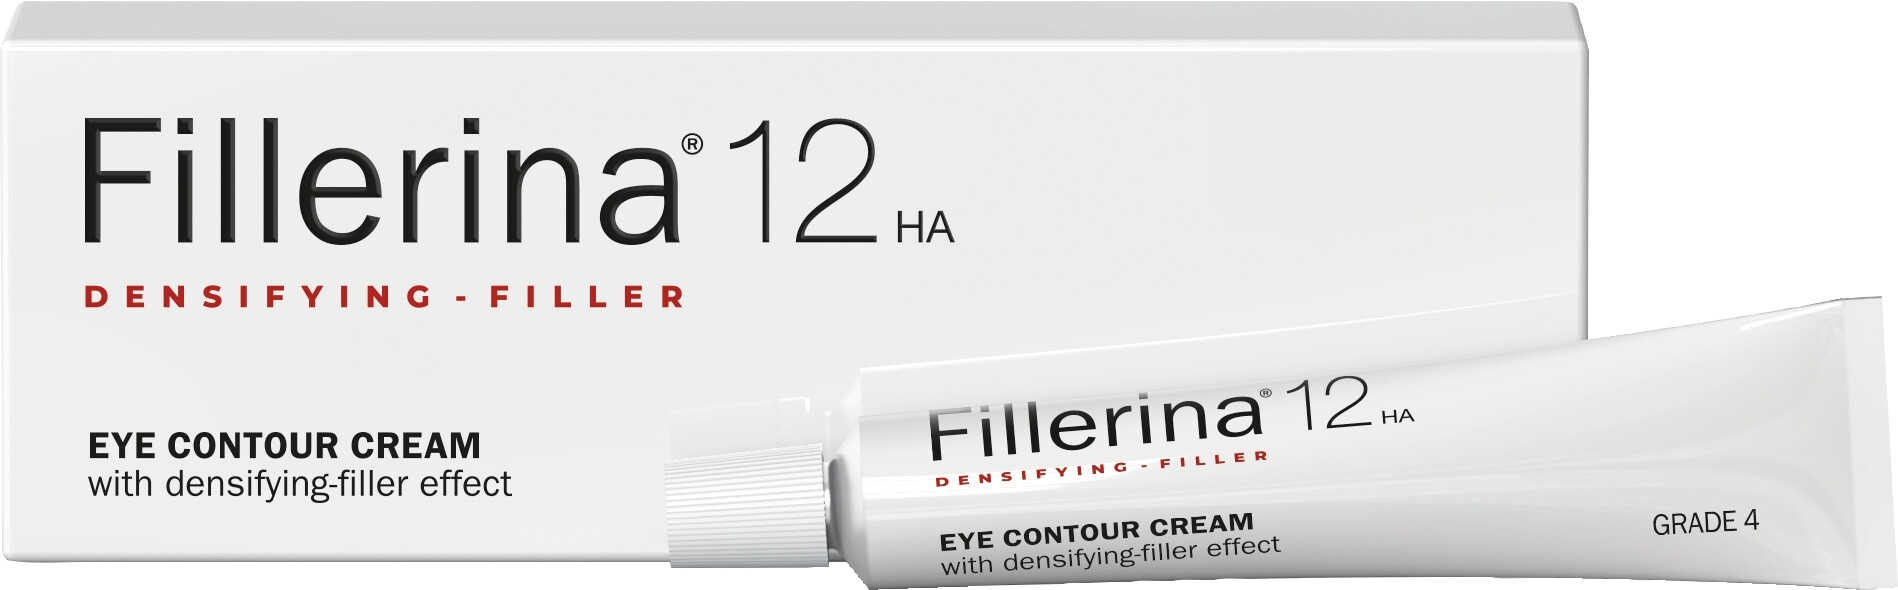 Fillerina 12HA Densifying-Filler Eye Contour Cream Grade 4 - 15ml